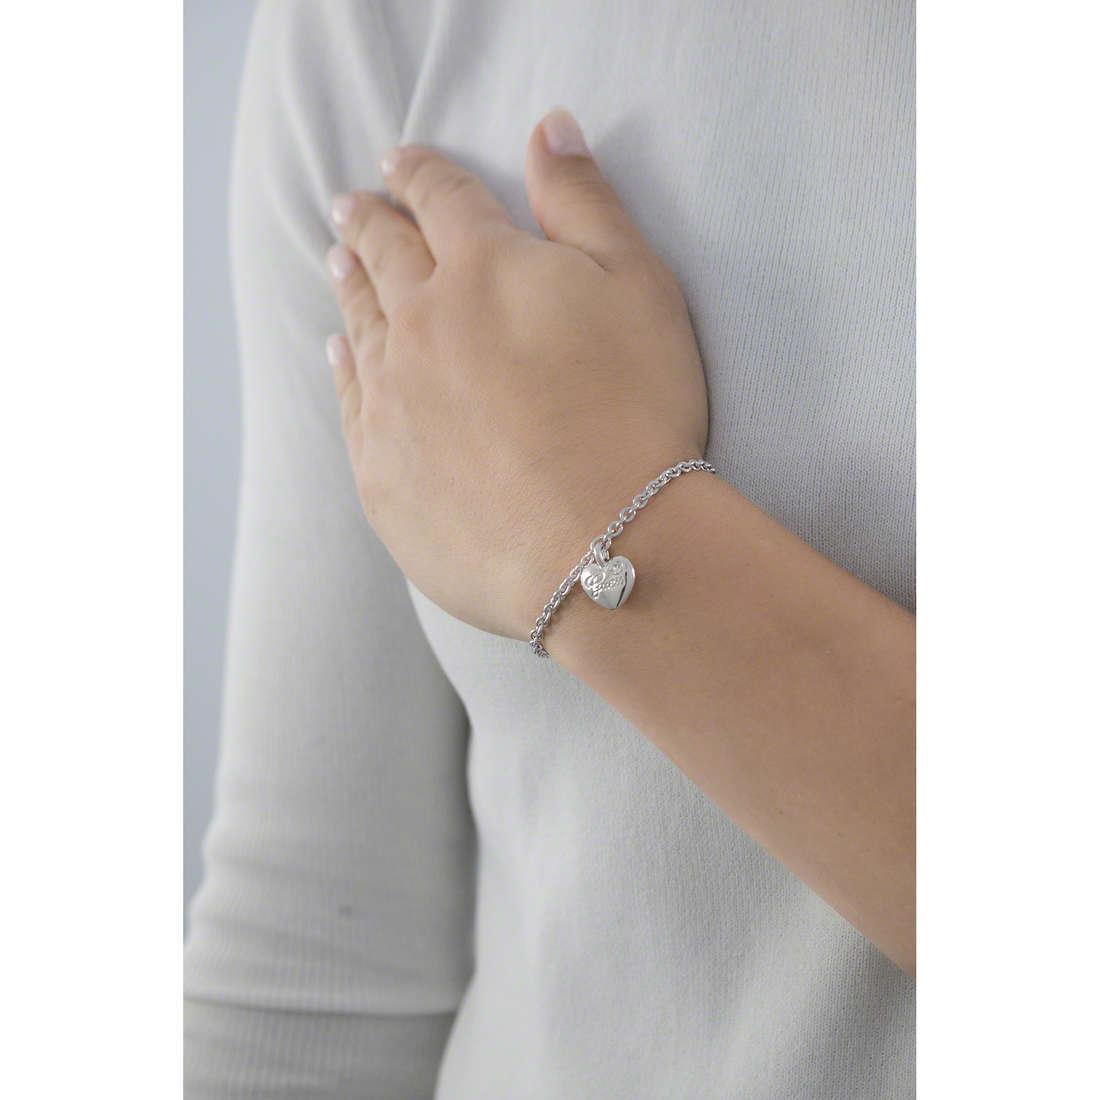 Guess bracciali Iconic donna UBB21527-S indosso